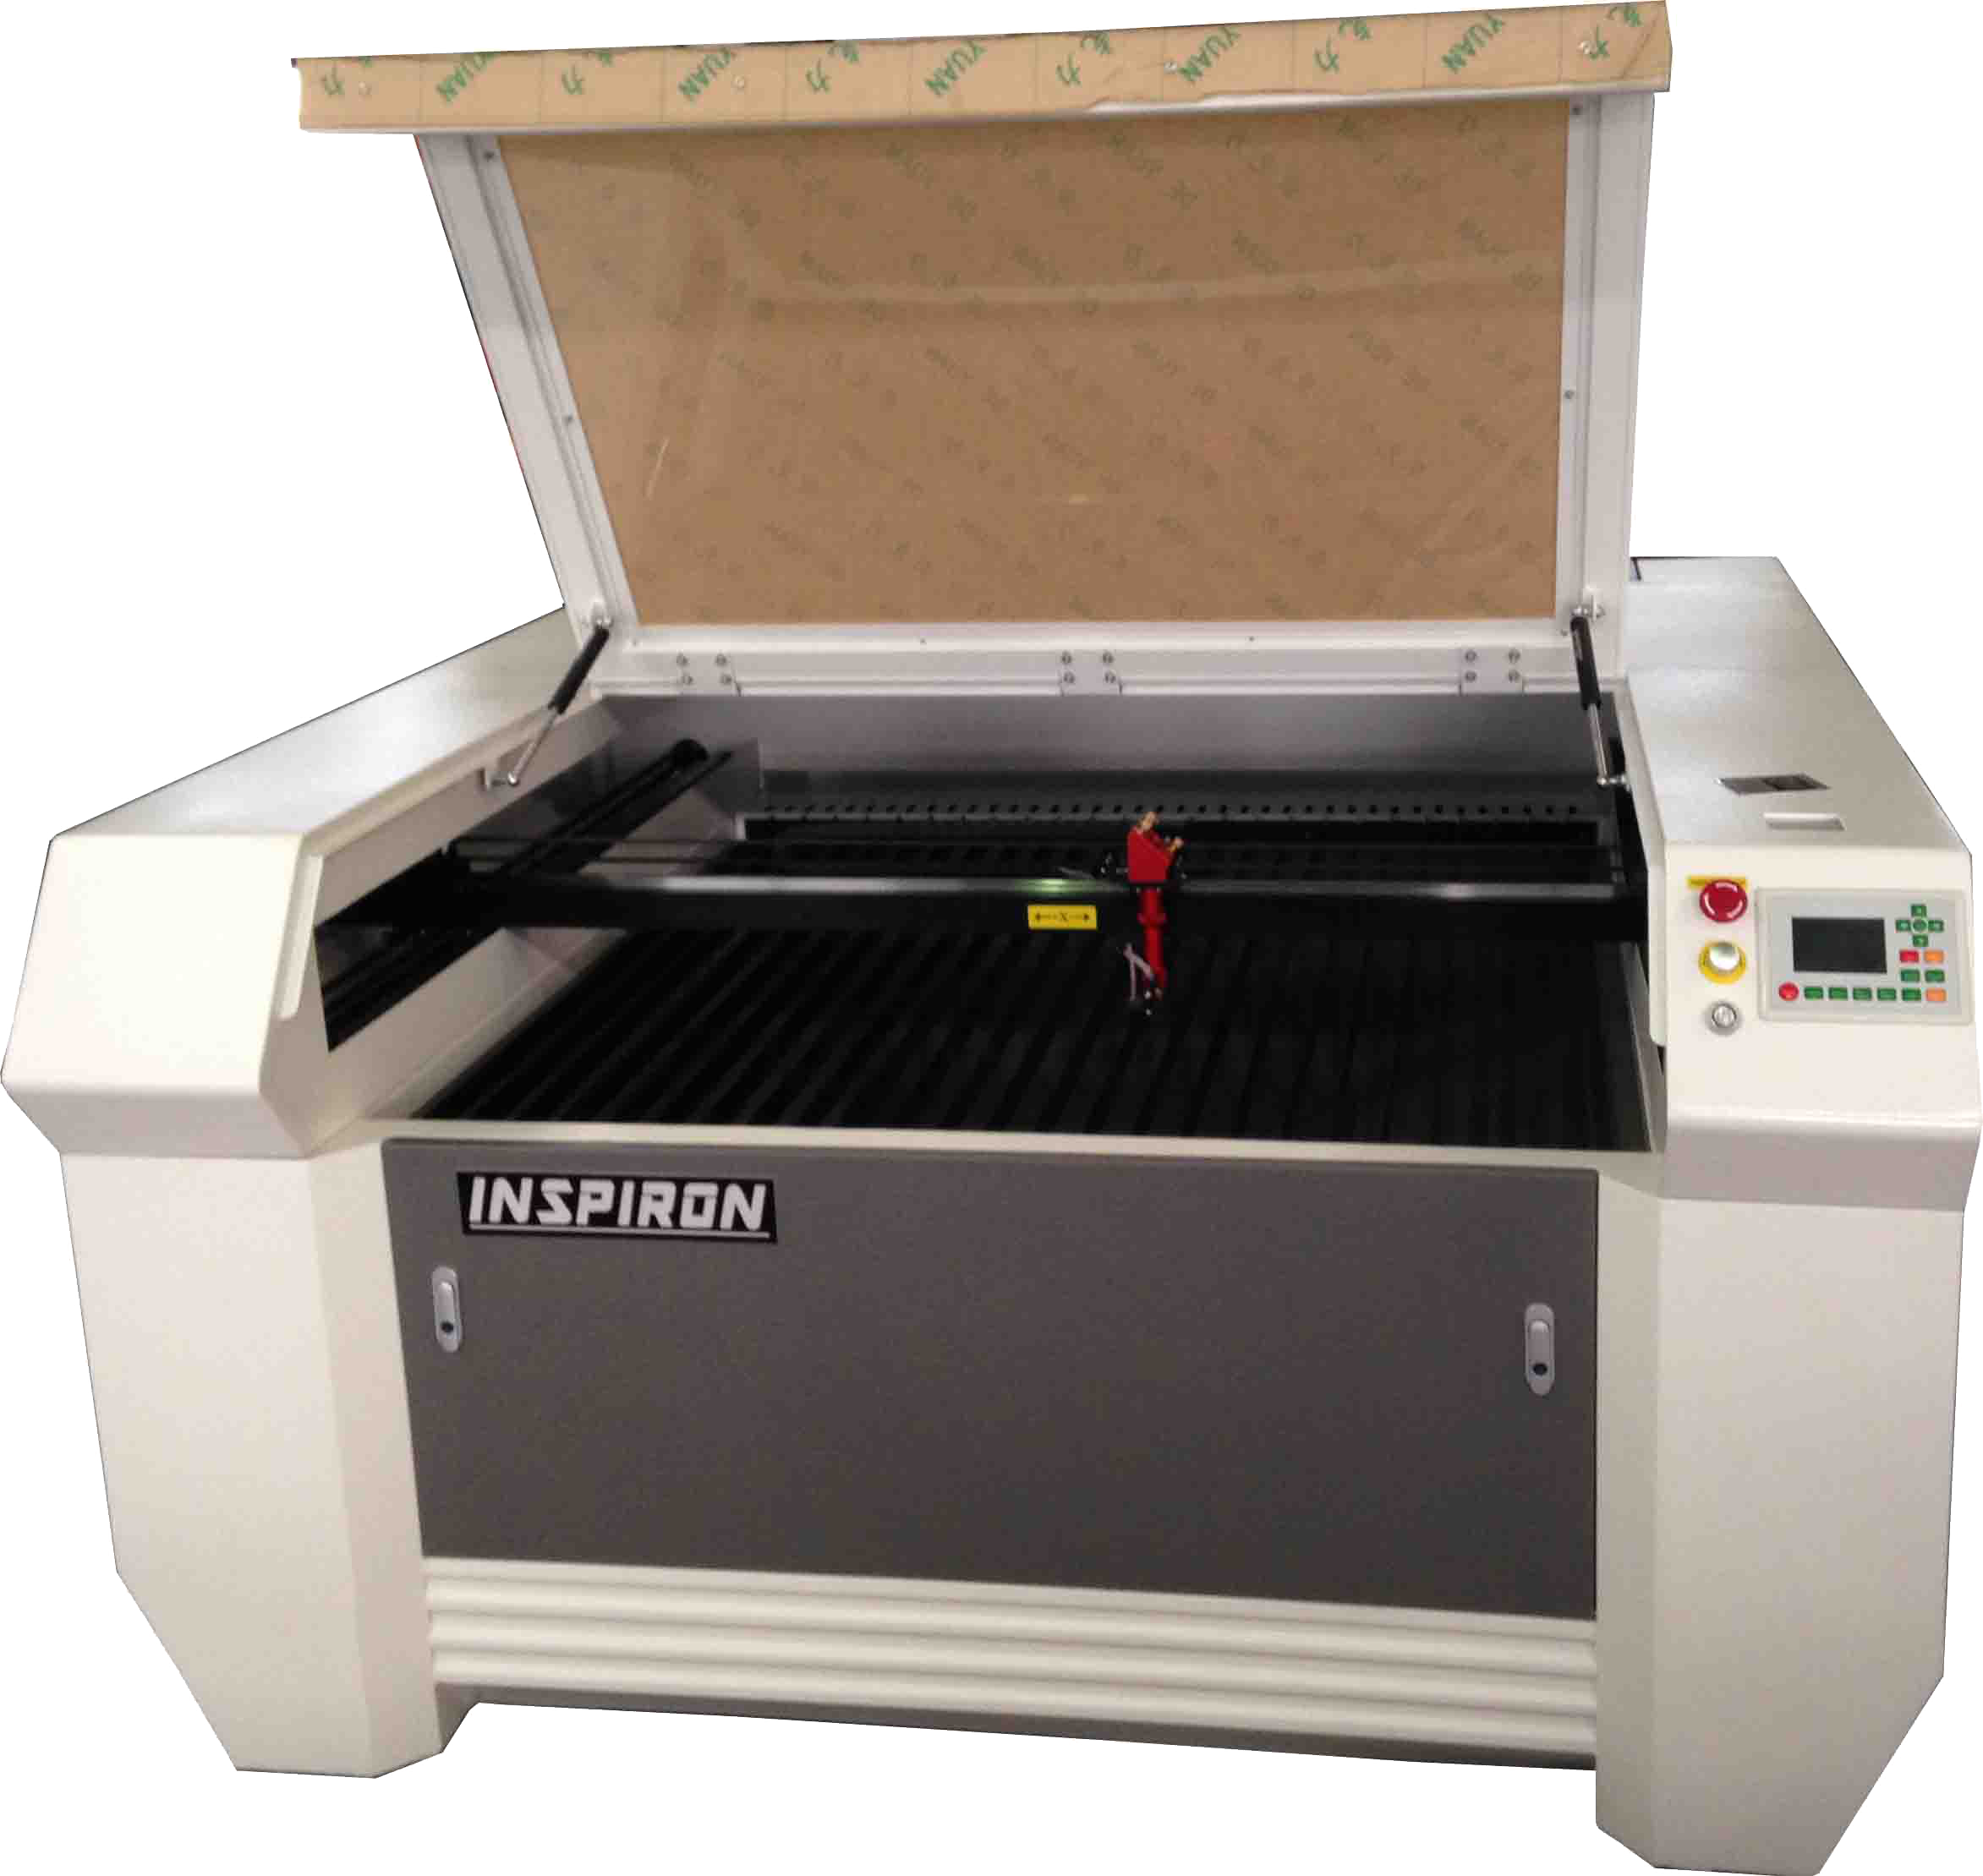 Inspiron-Laser-1212